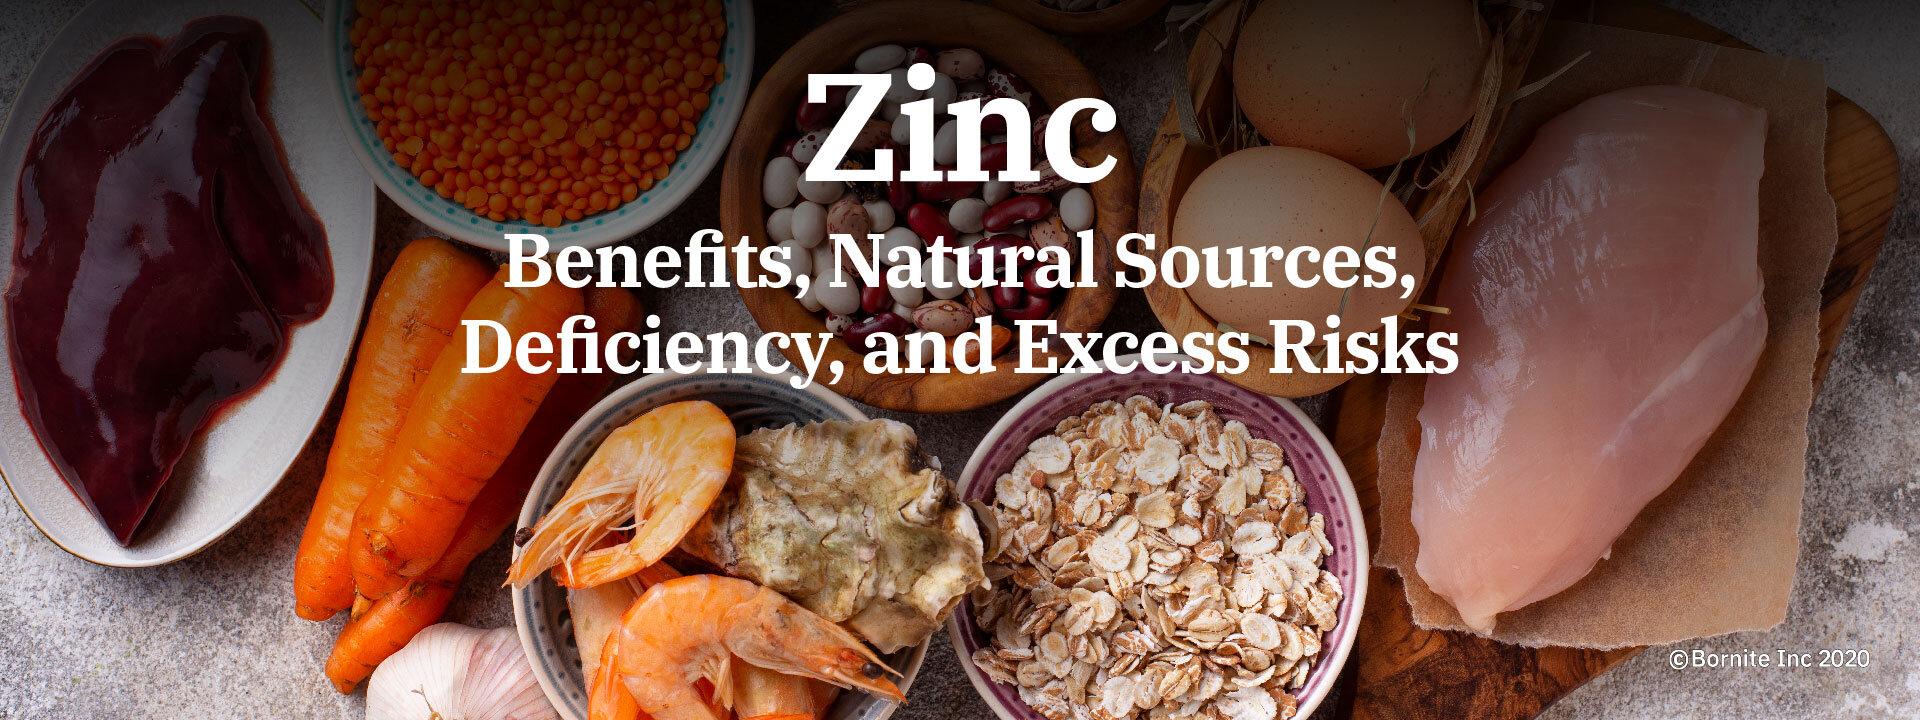 Zinc: Benefits, Dosage, Natural Sources, Deficiency, and excess risks - Bornite - Bornite Inc - Bornite Toronto